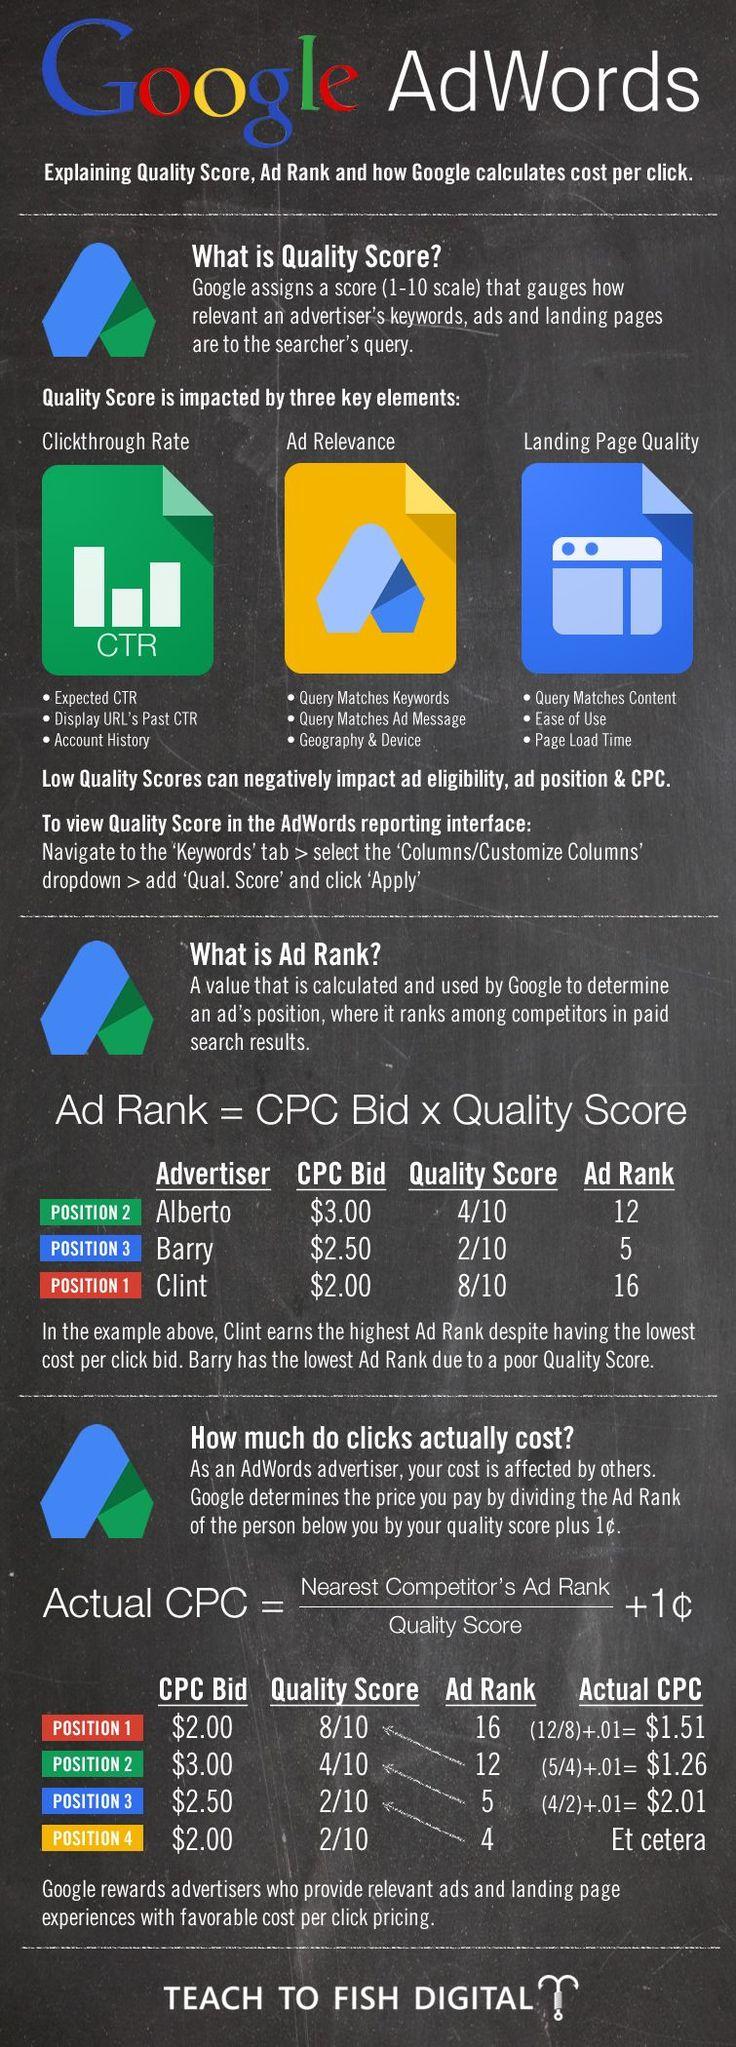 Advertising-Infographics-Google-Adwords-Quality-Score-Infographic-via-Chris-Sietsema-teachtofishdigita Advertising Infographics : Google Adwords Quality Score Infographic via Chris Sietsema - teachtofishdigita....